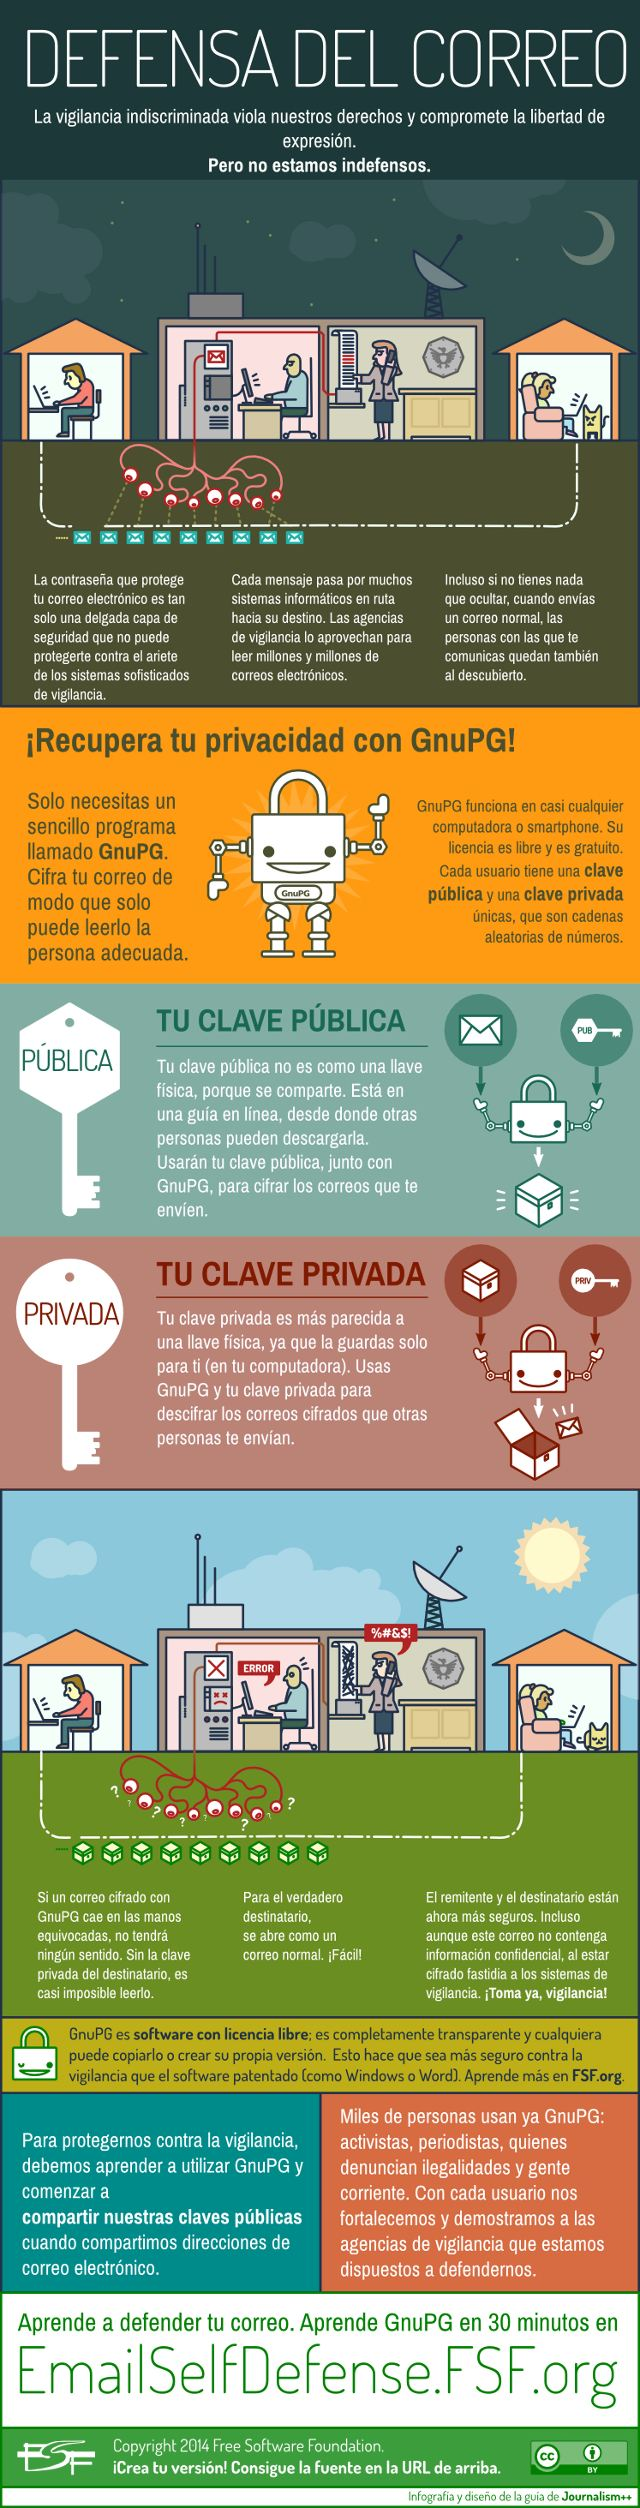 full-infographic_640